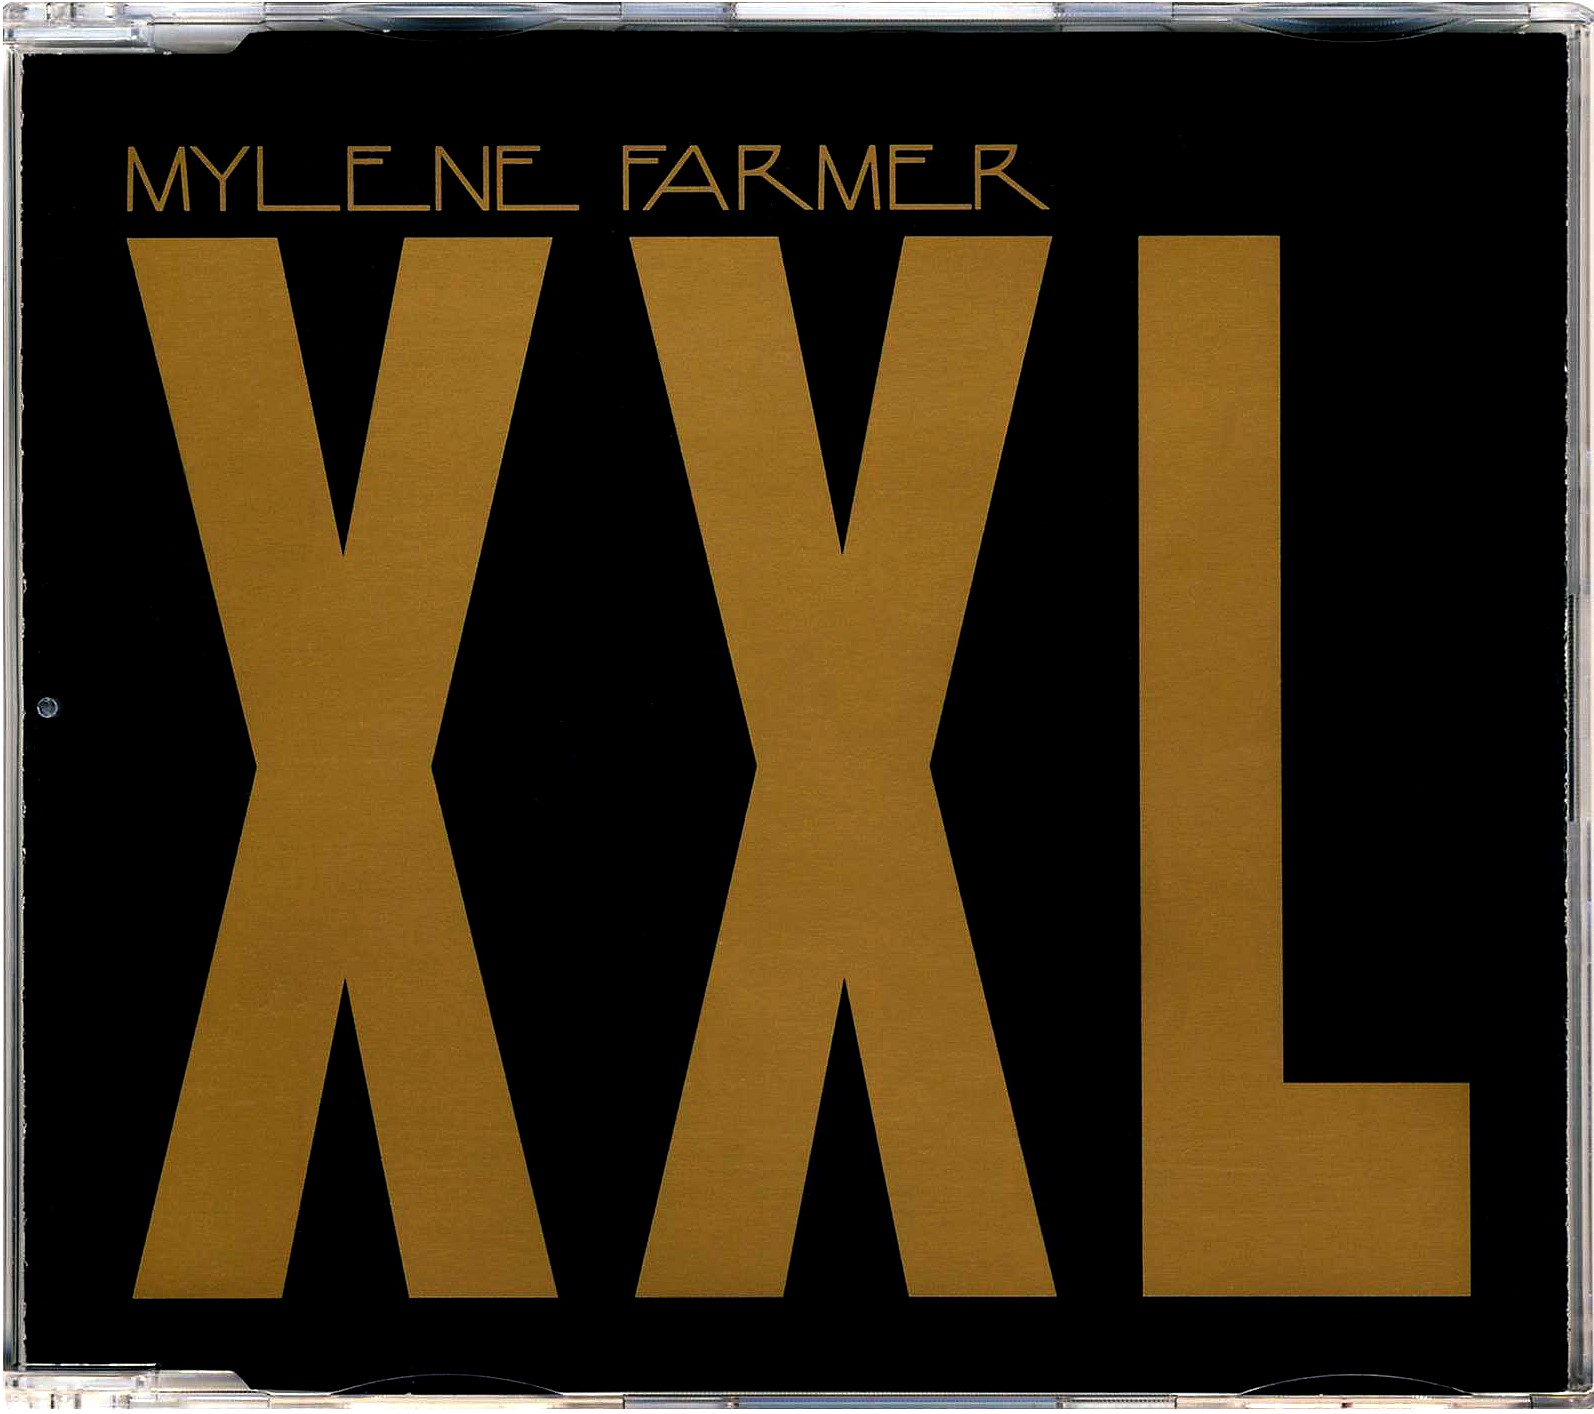 xxl promo